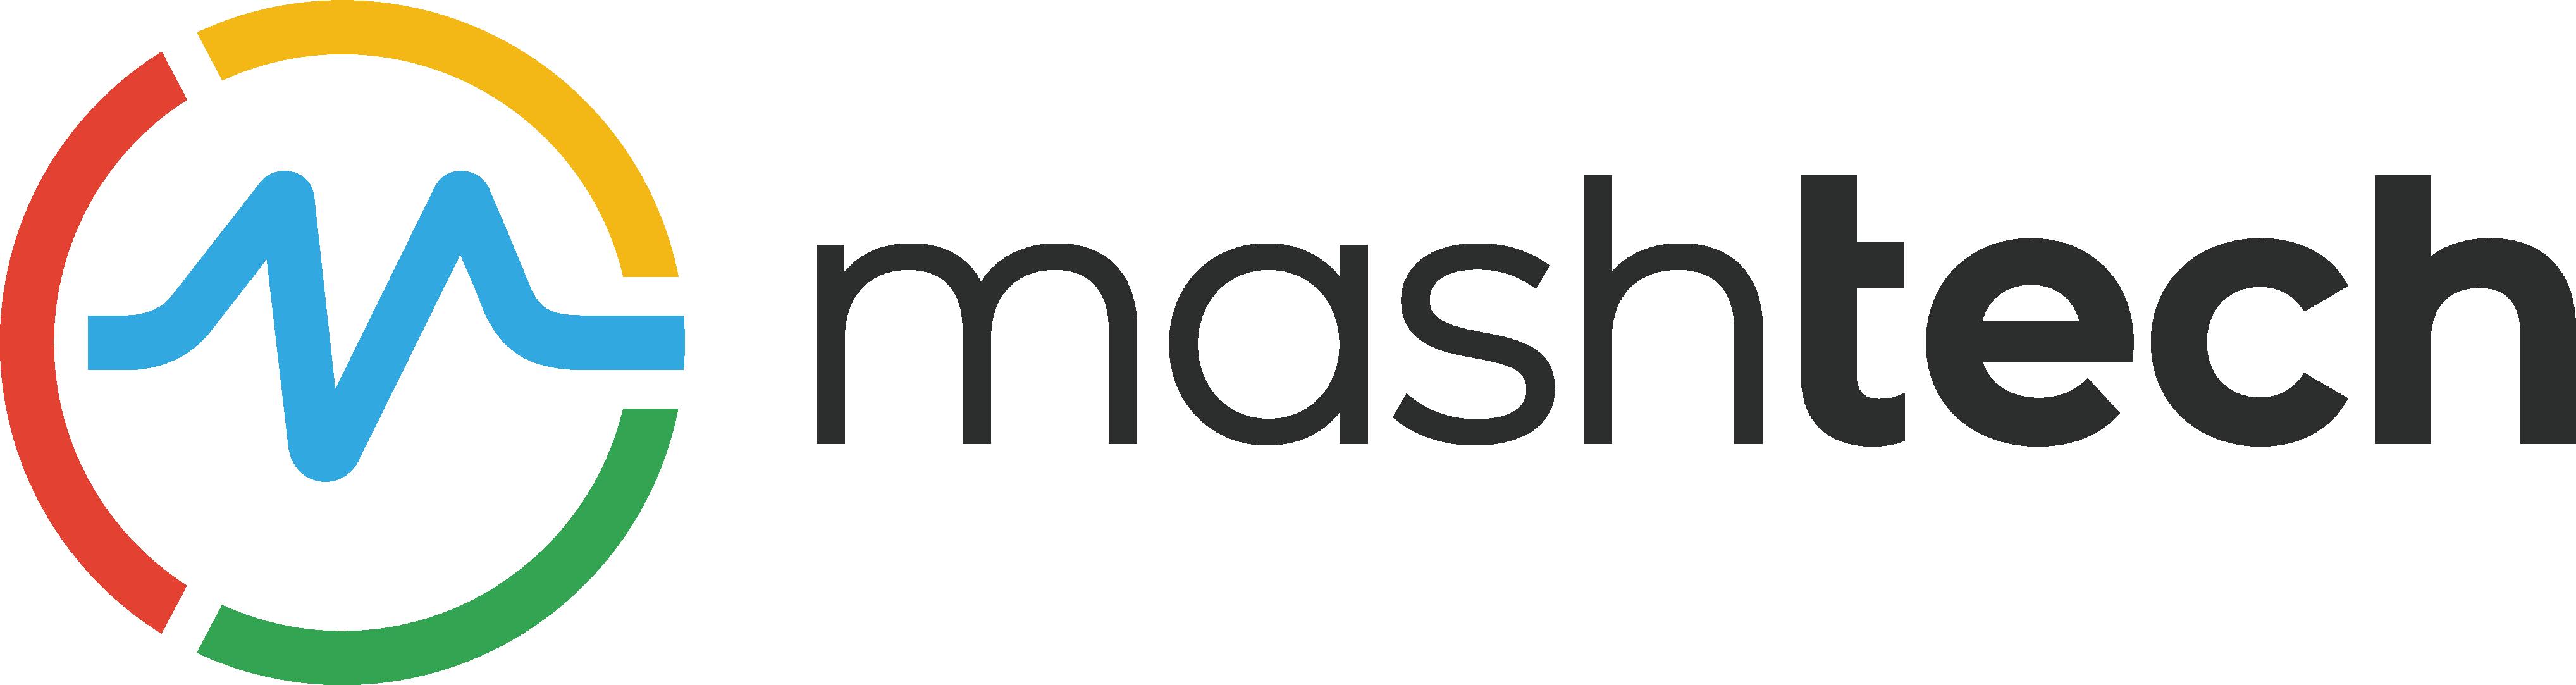 mashtech logo horz